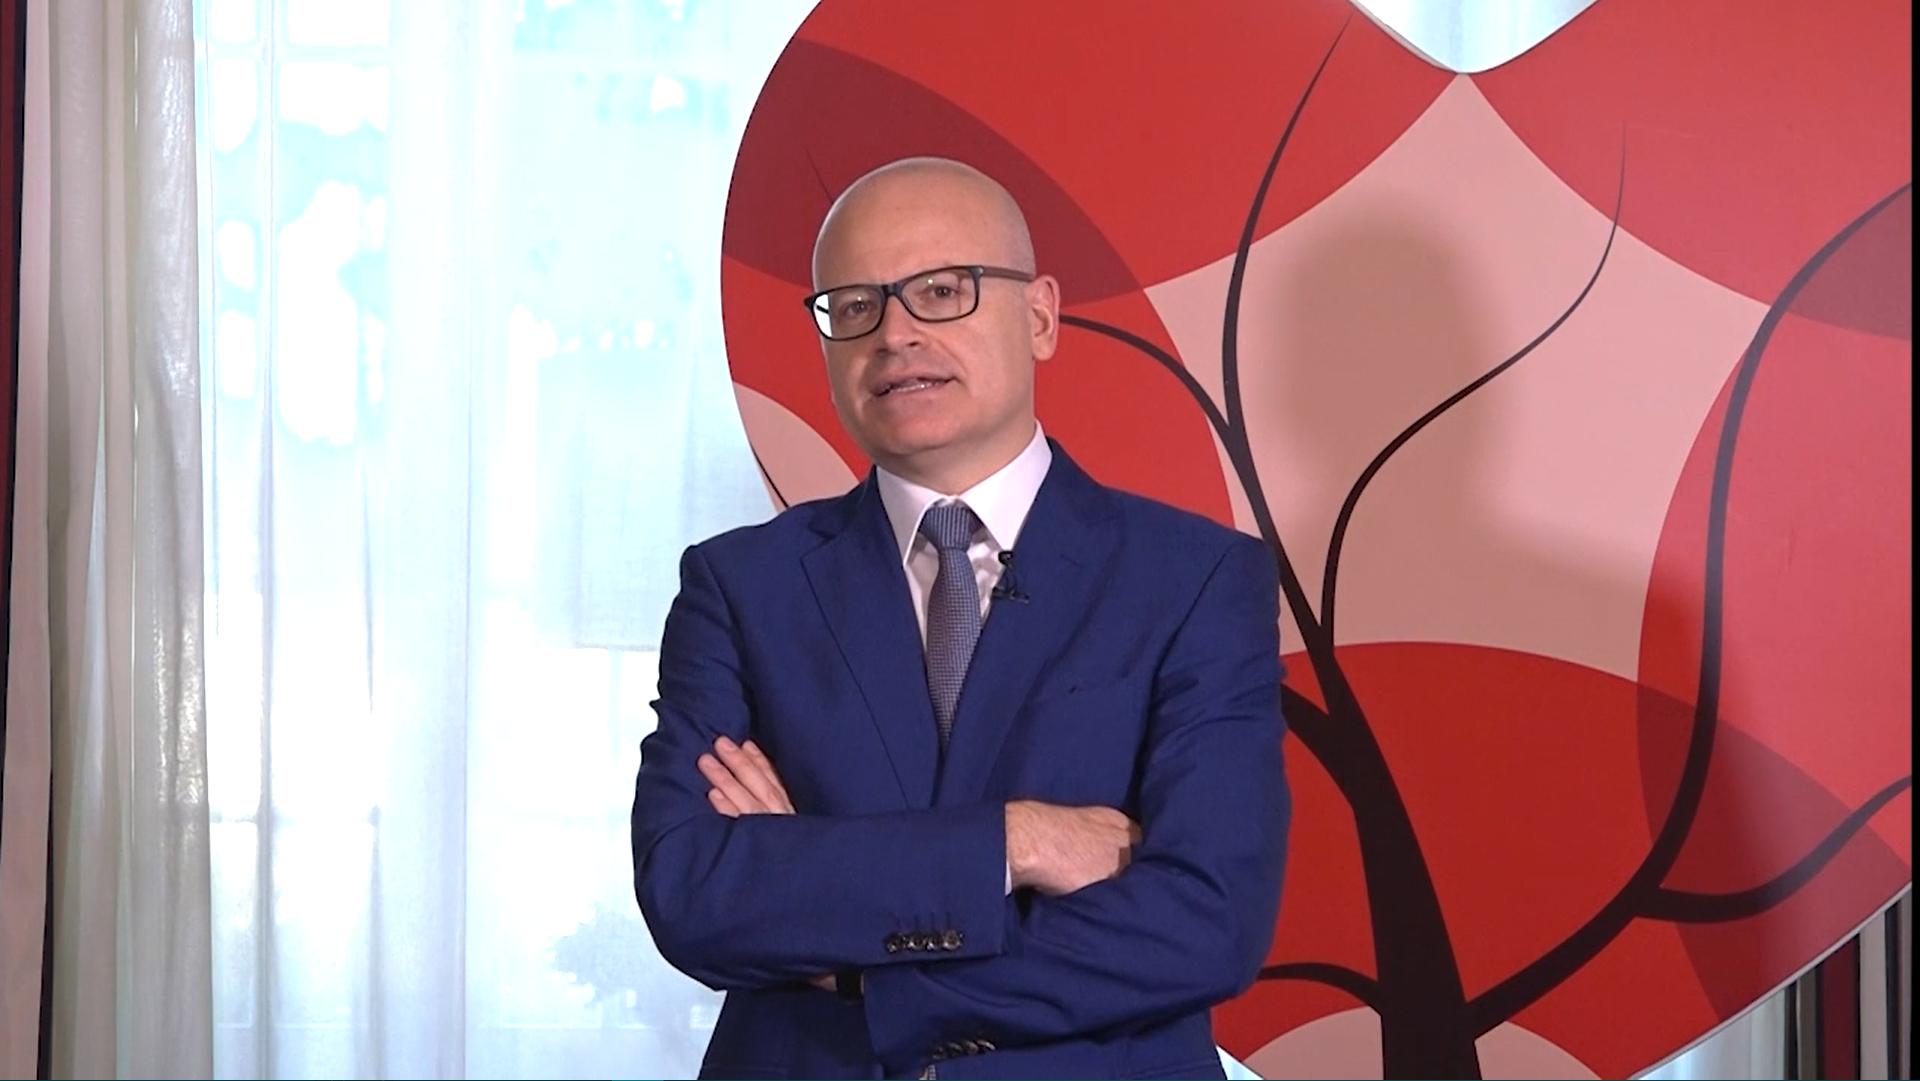 Suden death. A continuos challenge in cardiovascular medicine - Luca Santini